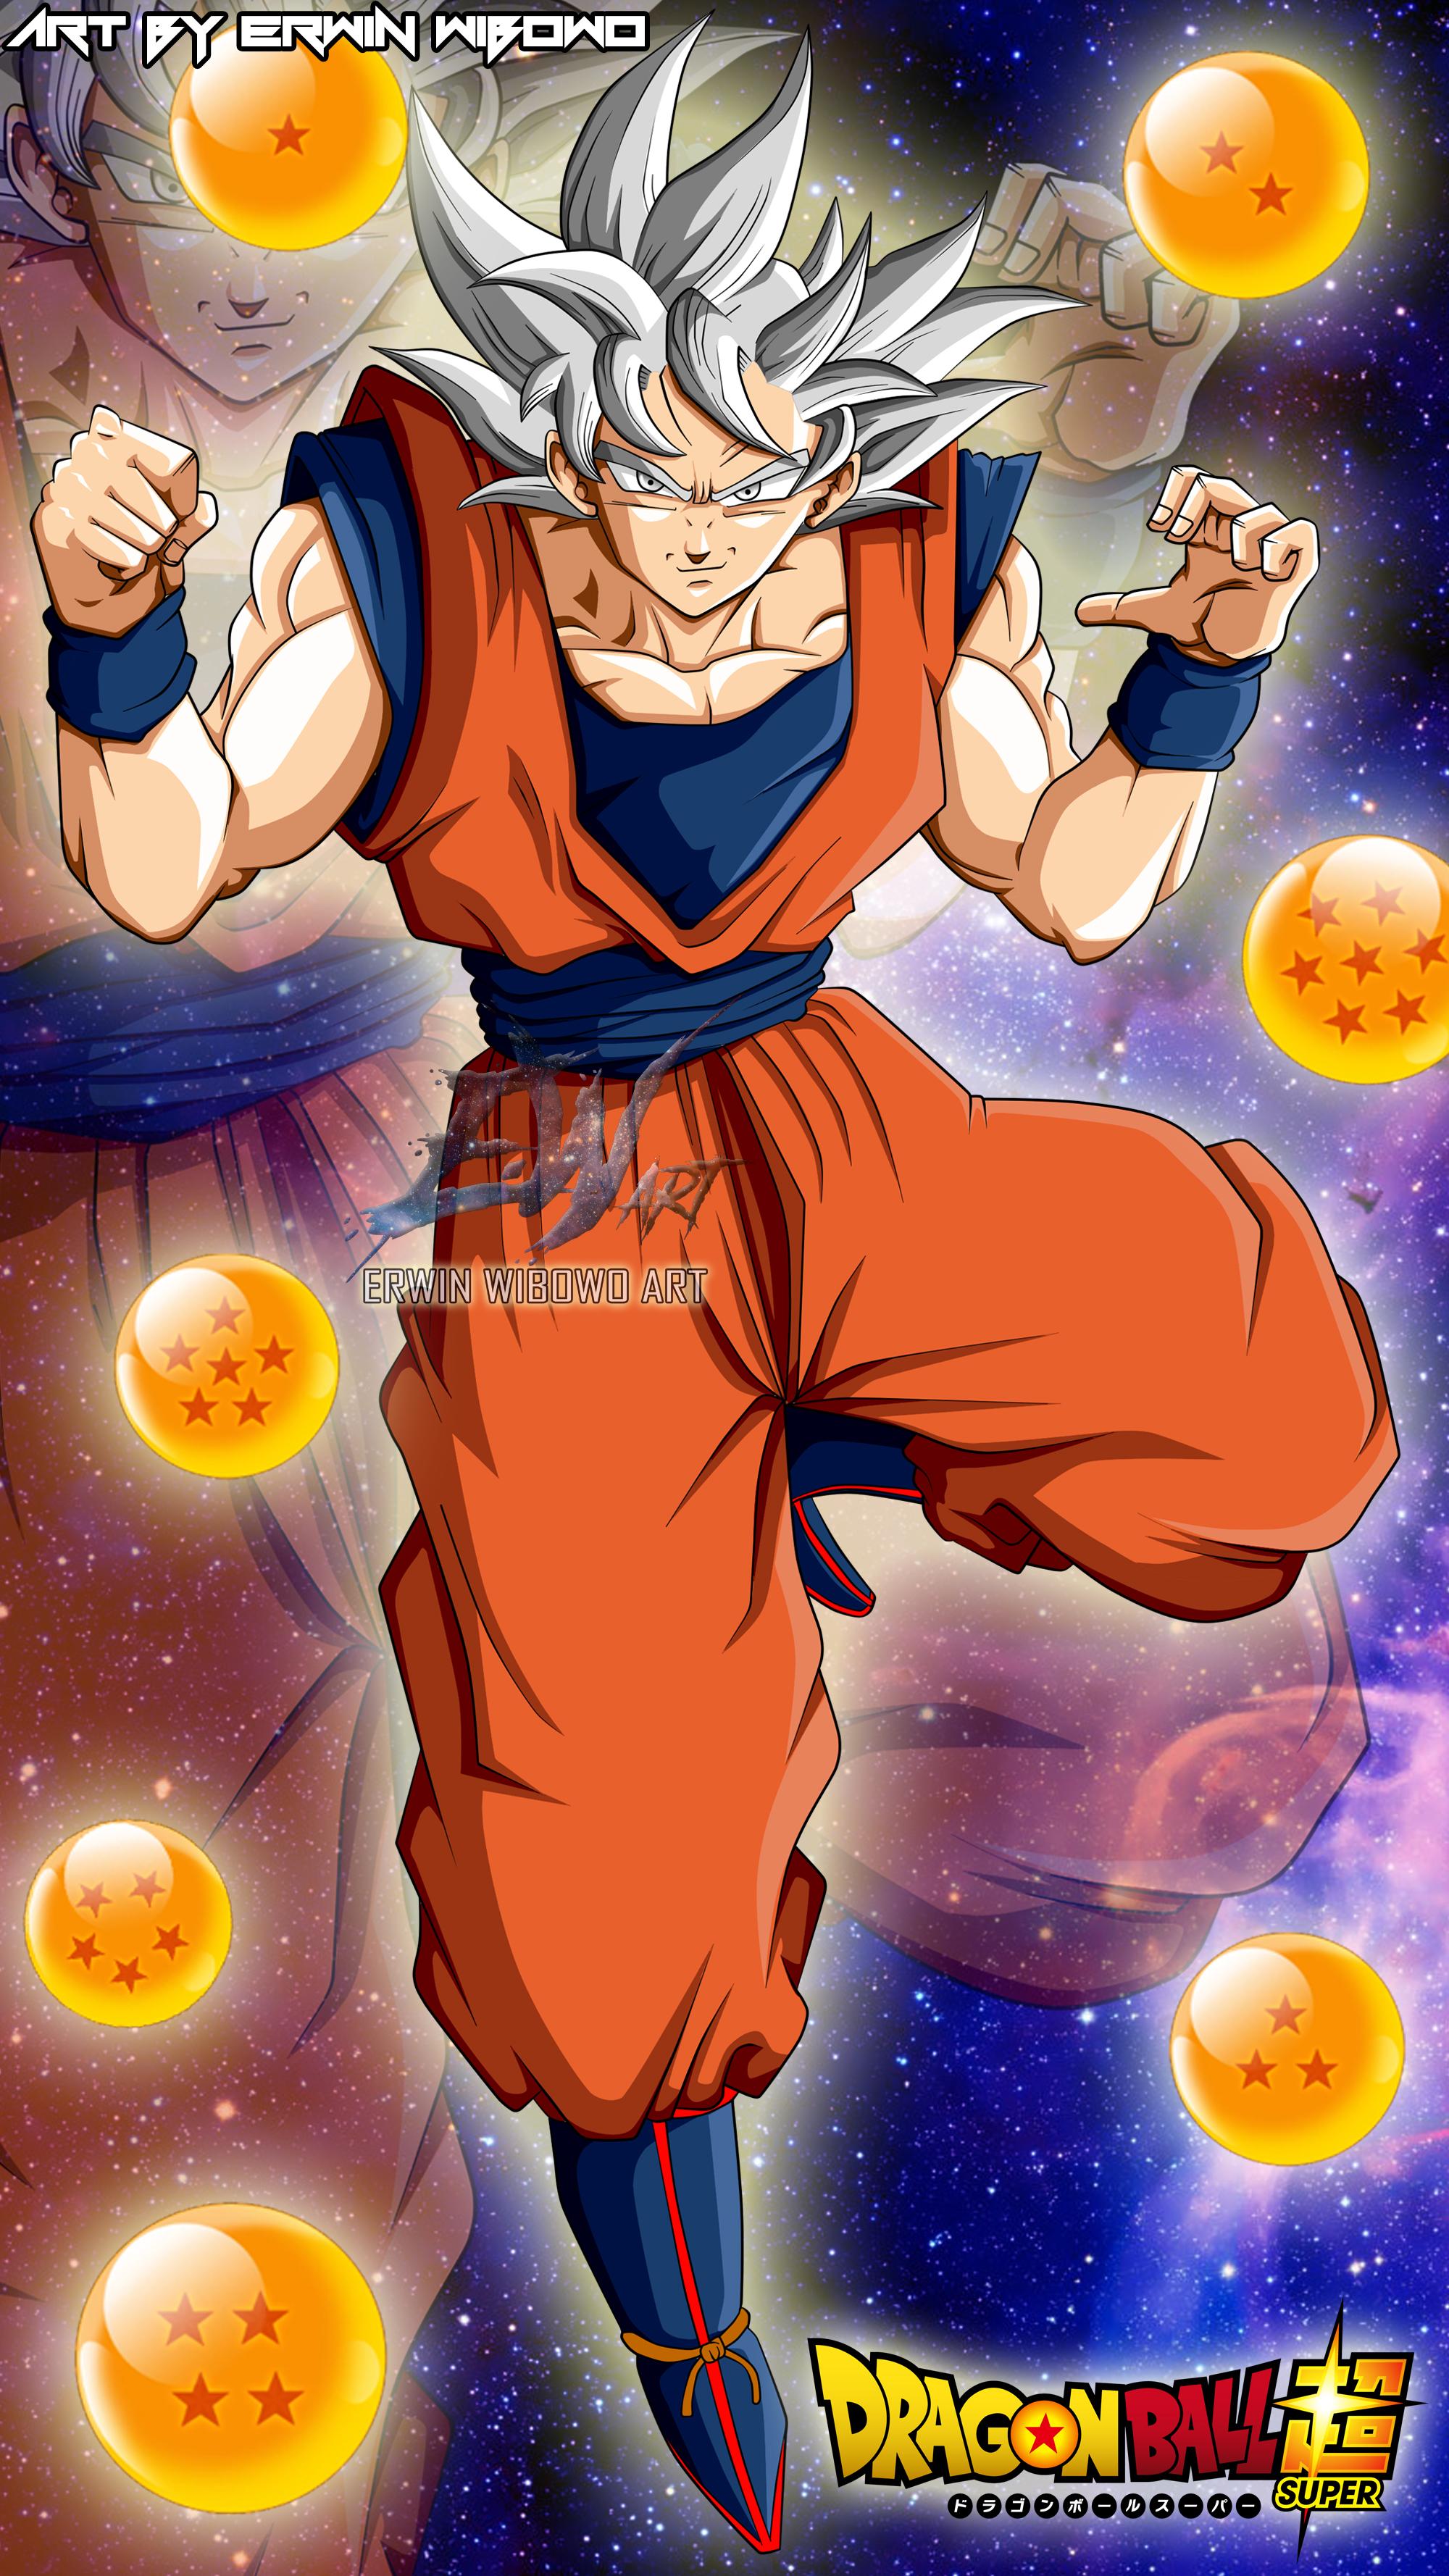 Son Goku Mastered Ultra Instinct Wallpaper By Erwinwibowoart On